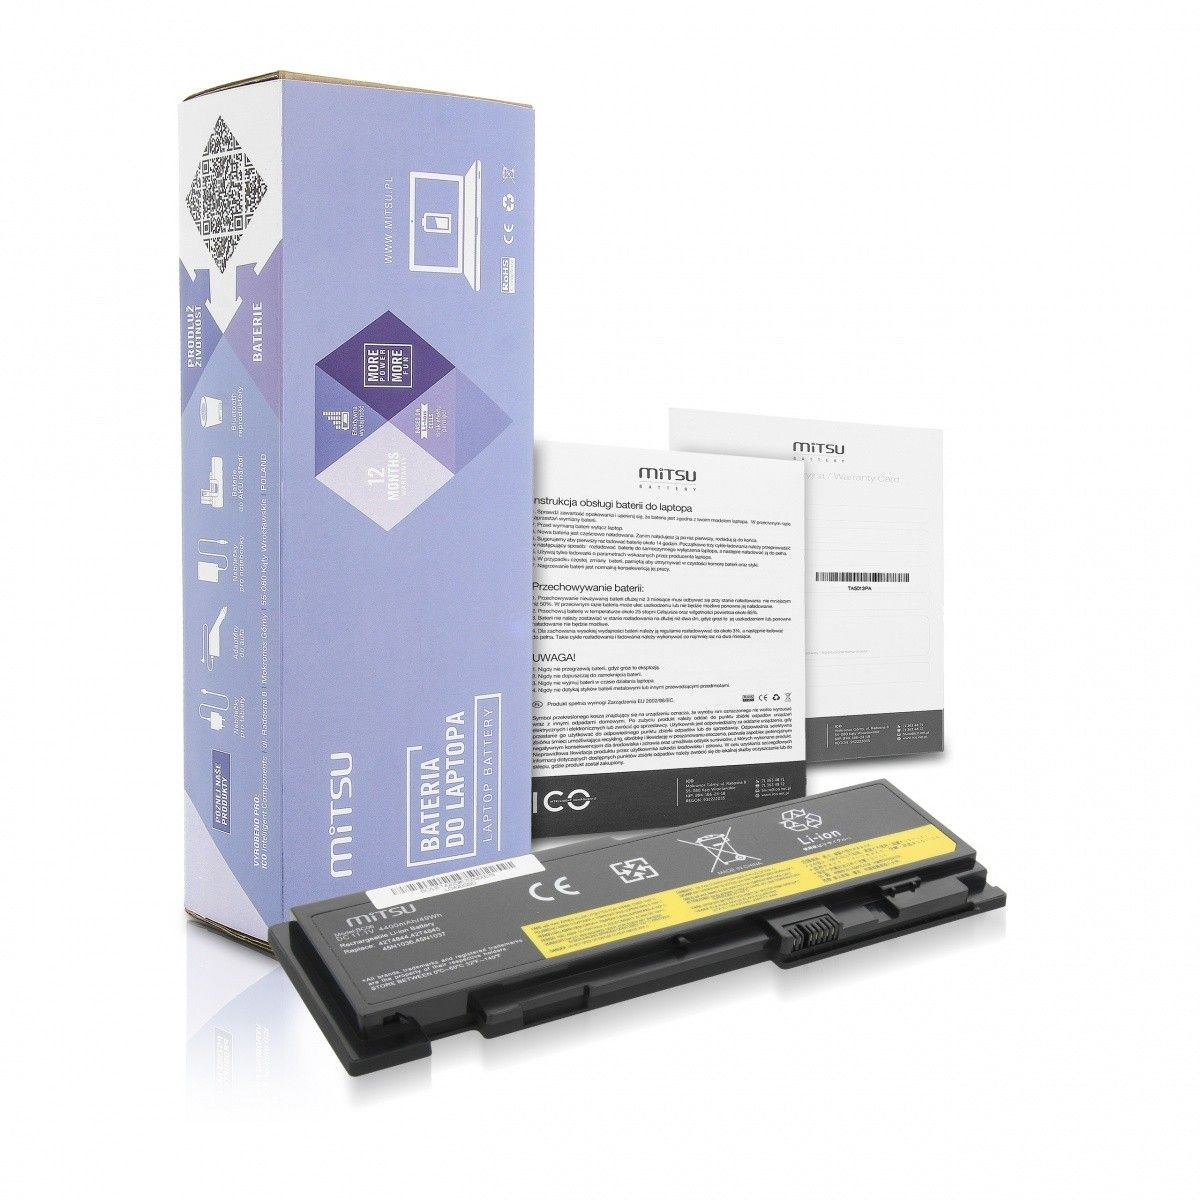 Mitsu Bateria do Lenovo Thinkpad T420s 3600 mAh (40 Wh) 10.8 - 11.1V